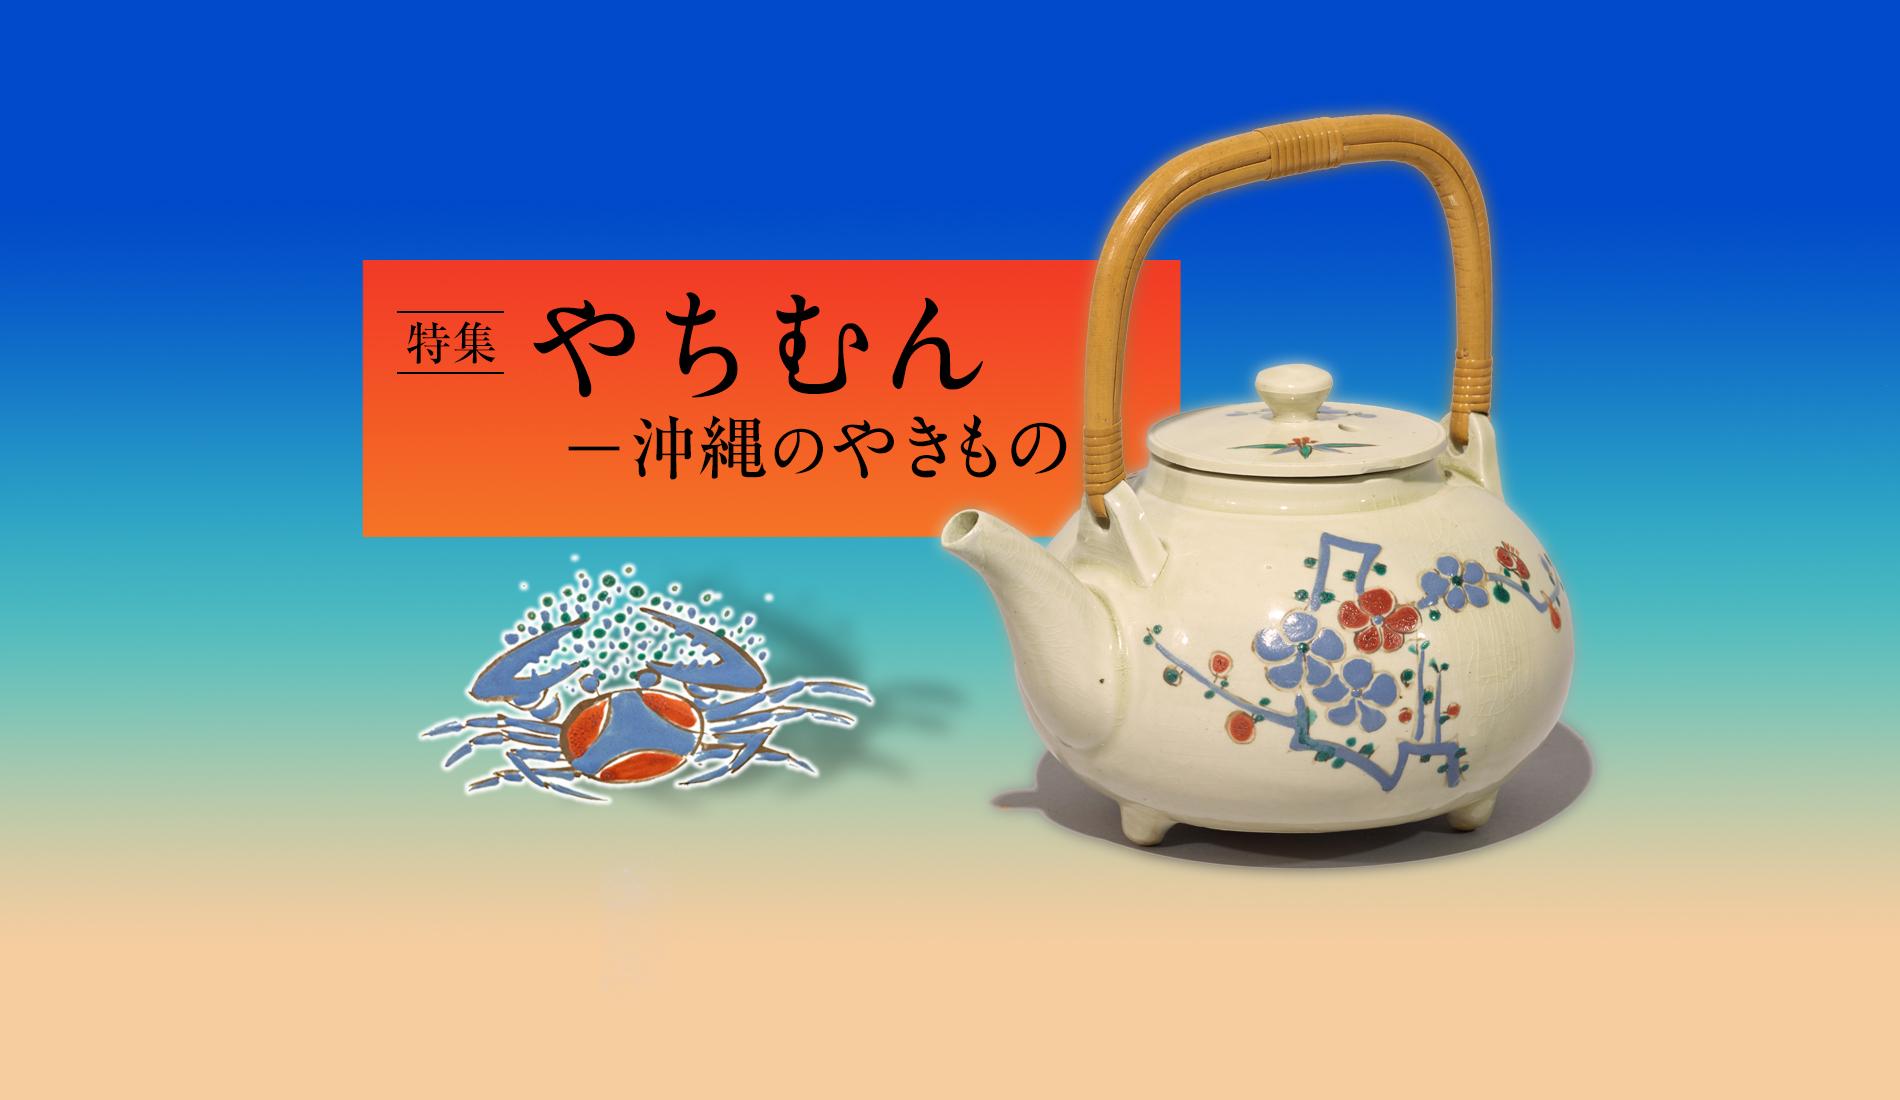 Yachimun – Okinawan Ceramics